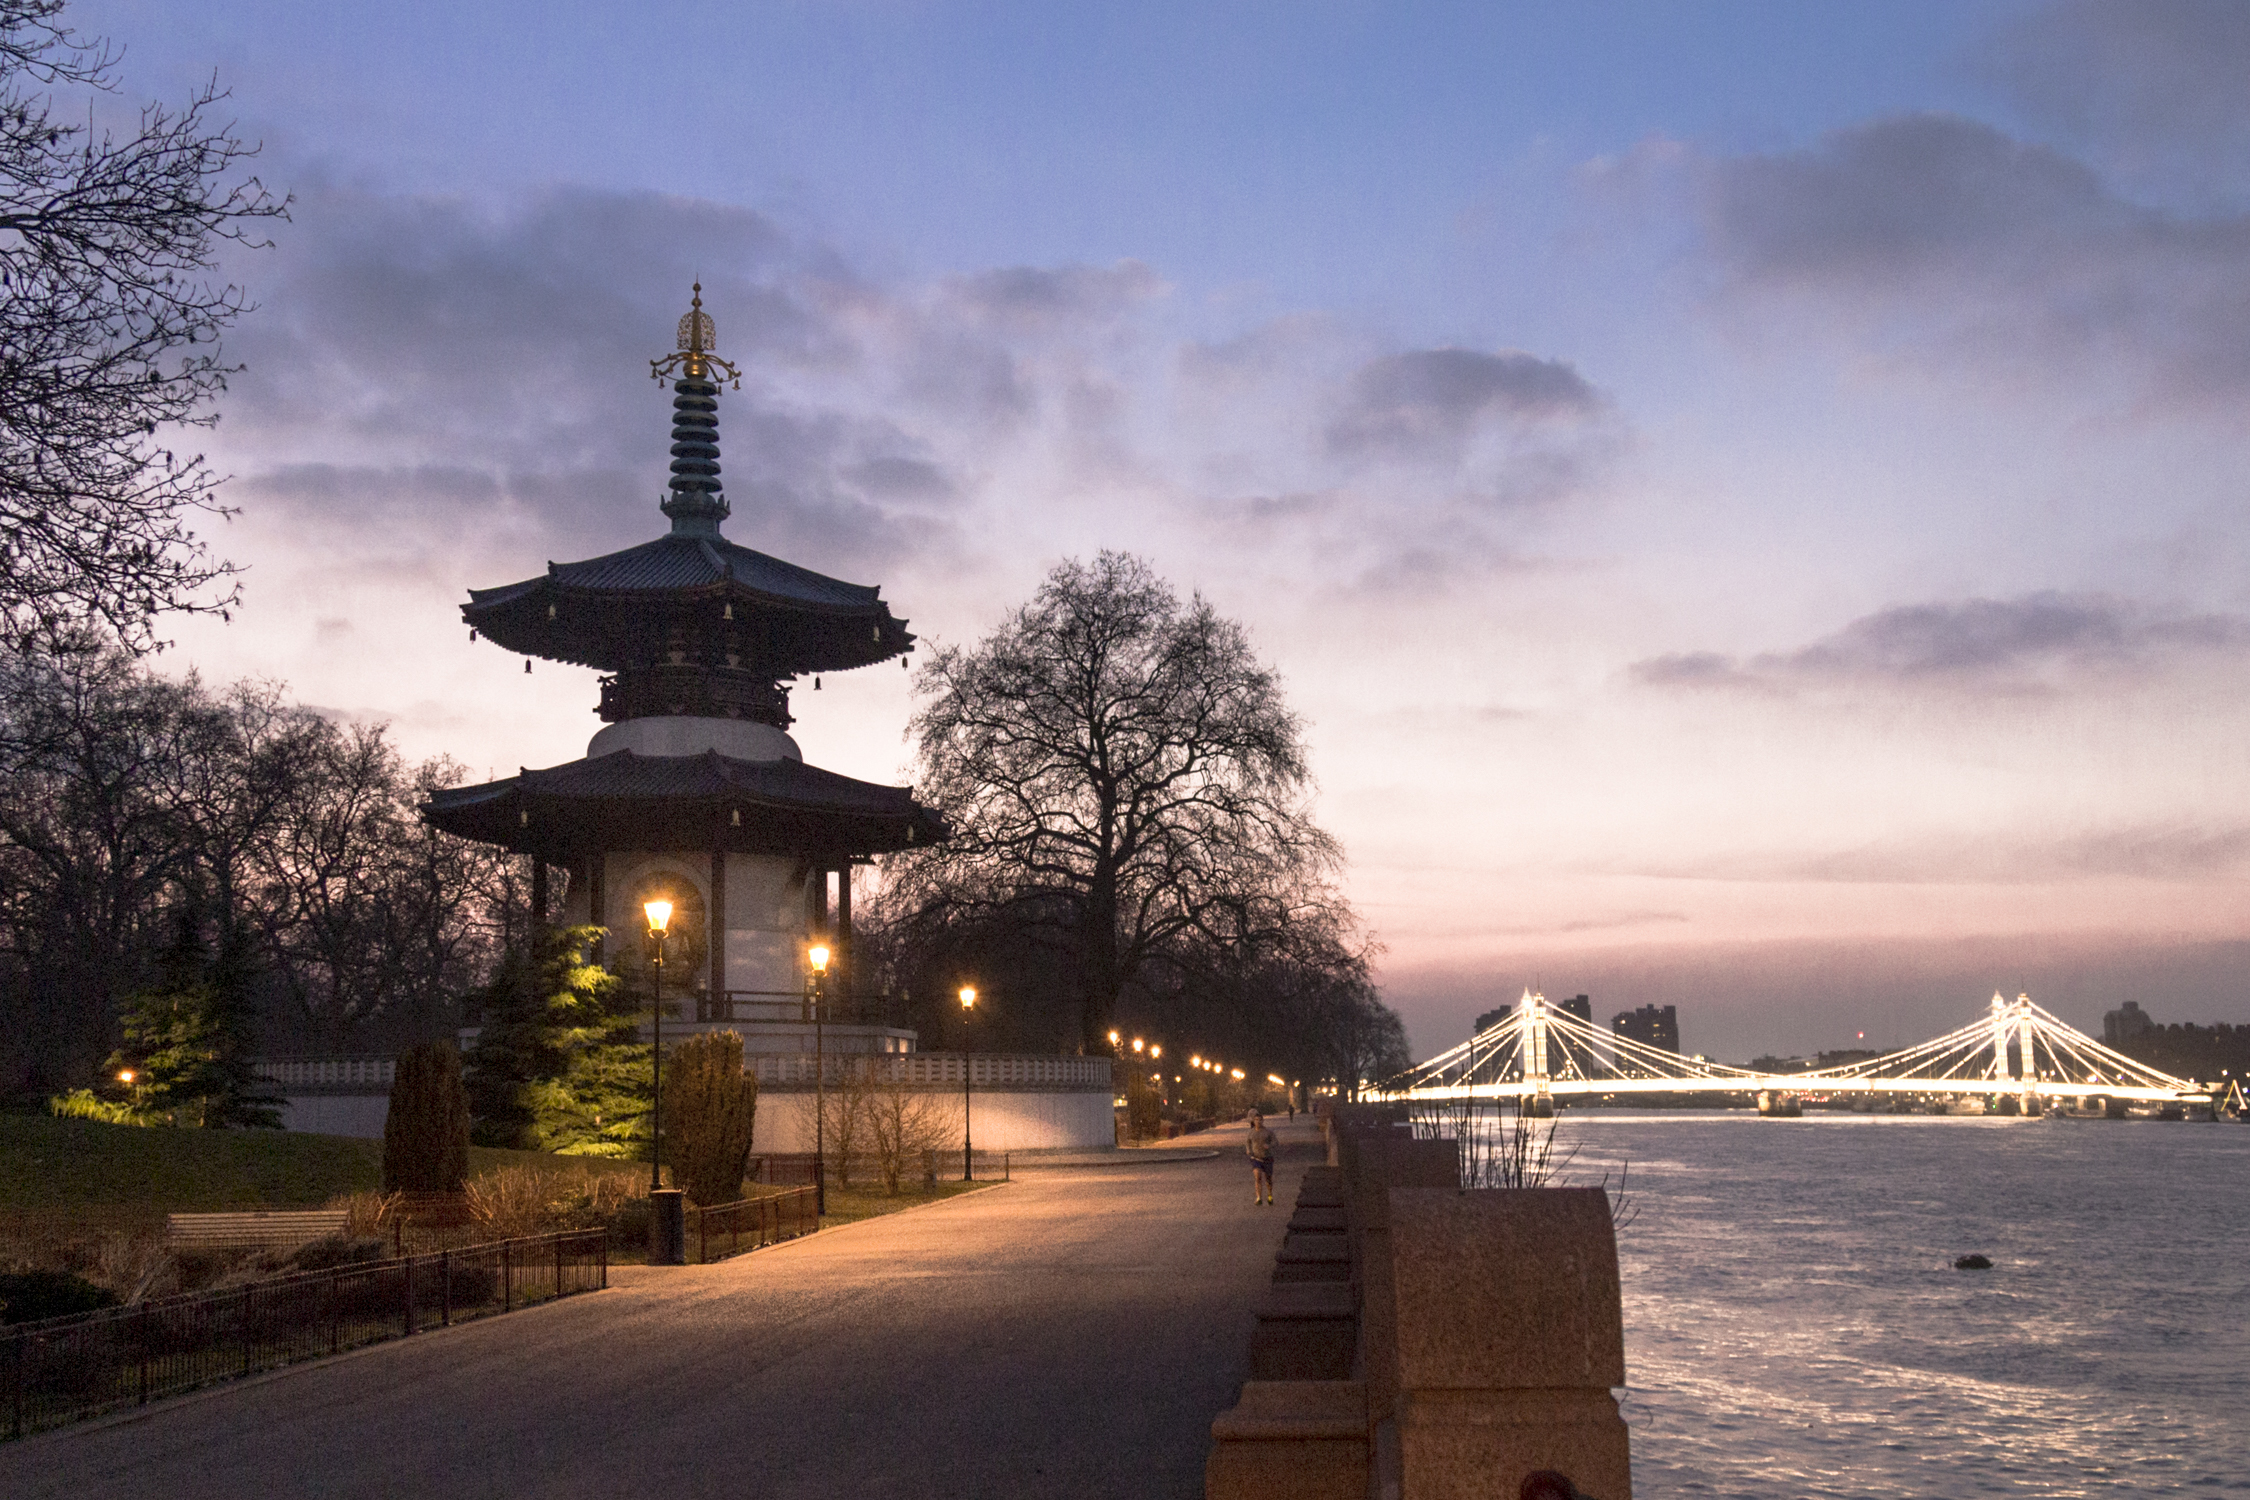 Battersea Park London IMG_1096